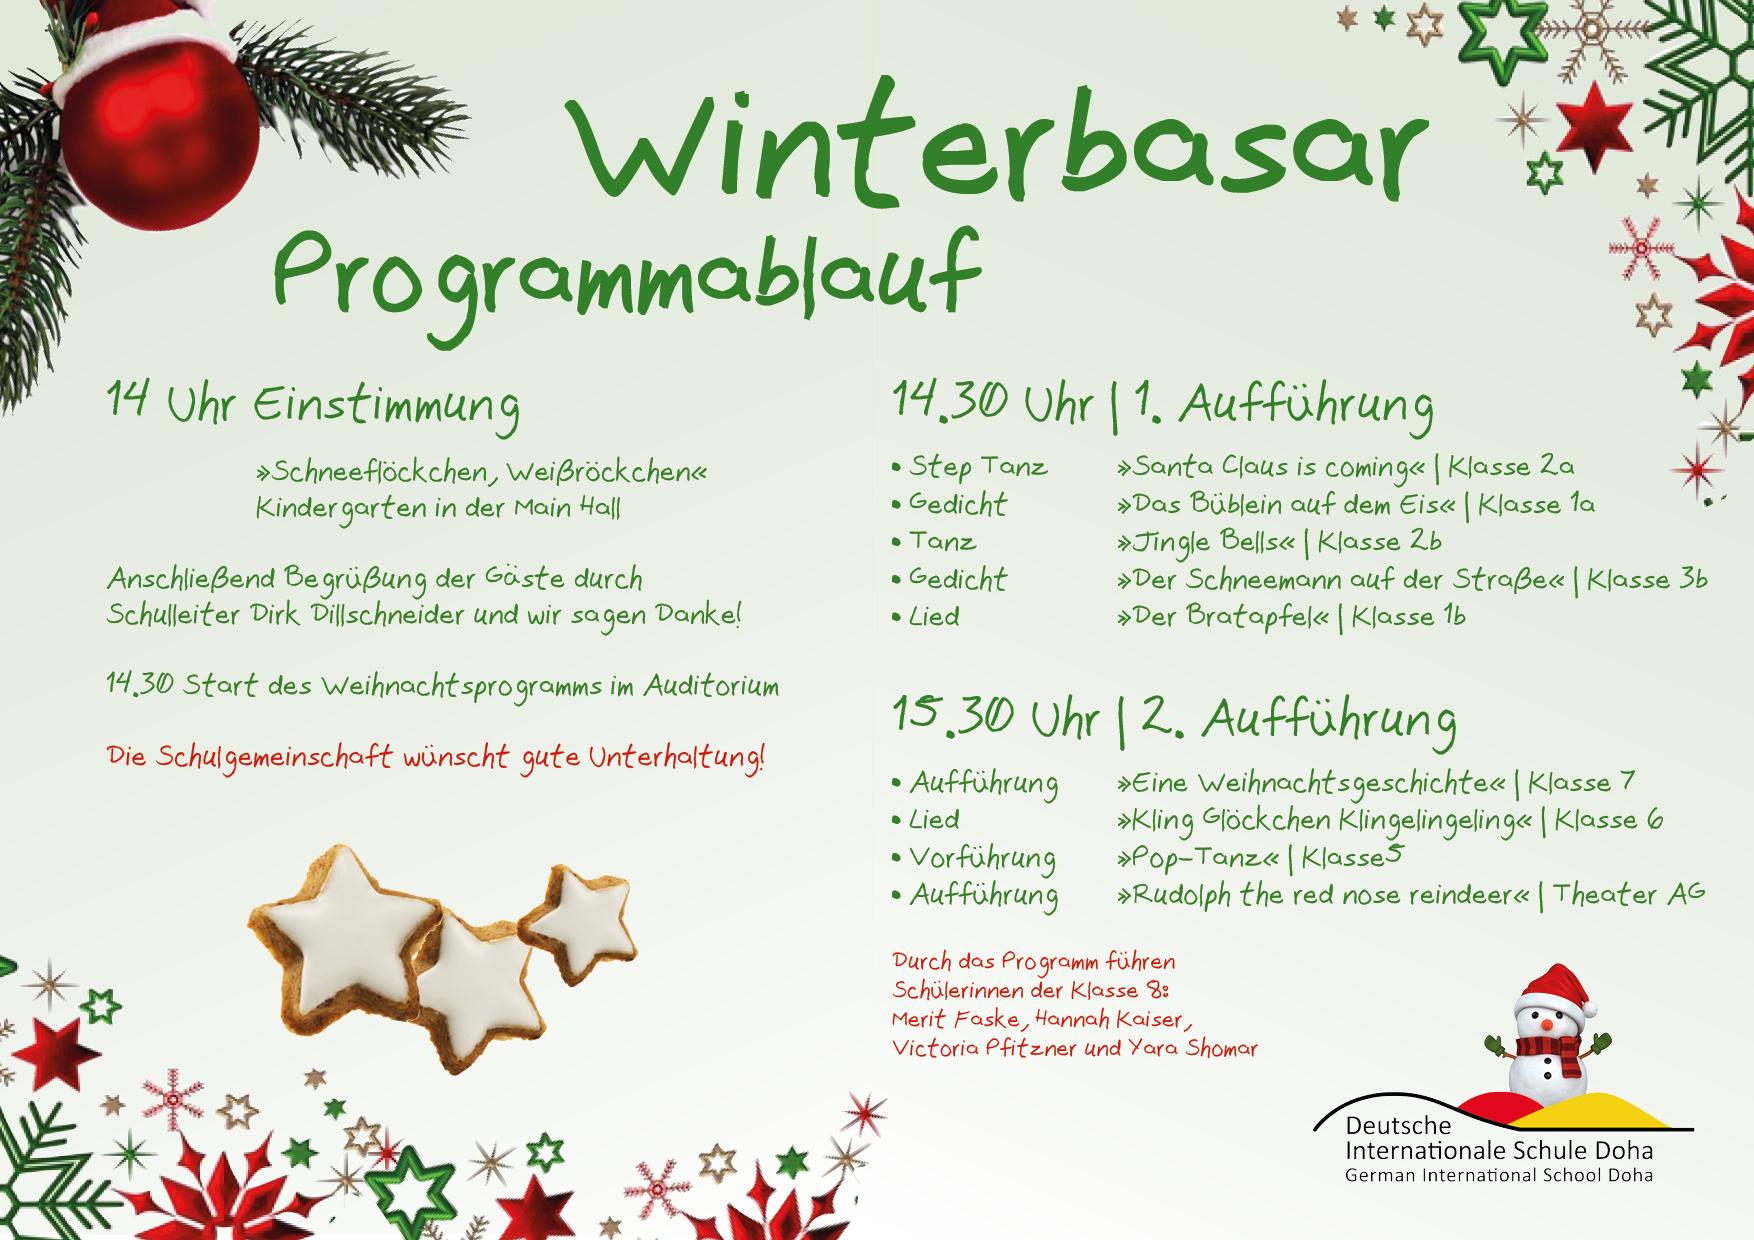 Winterbasar Programmablauf German International School